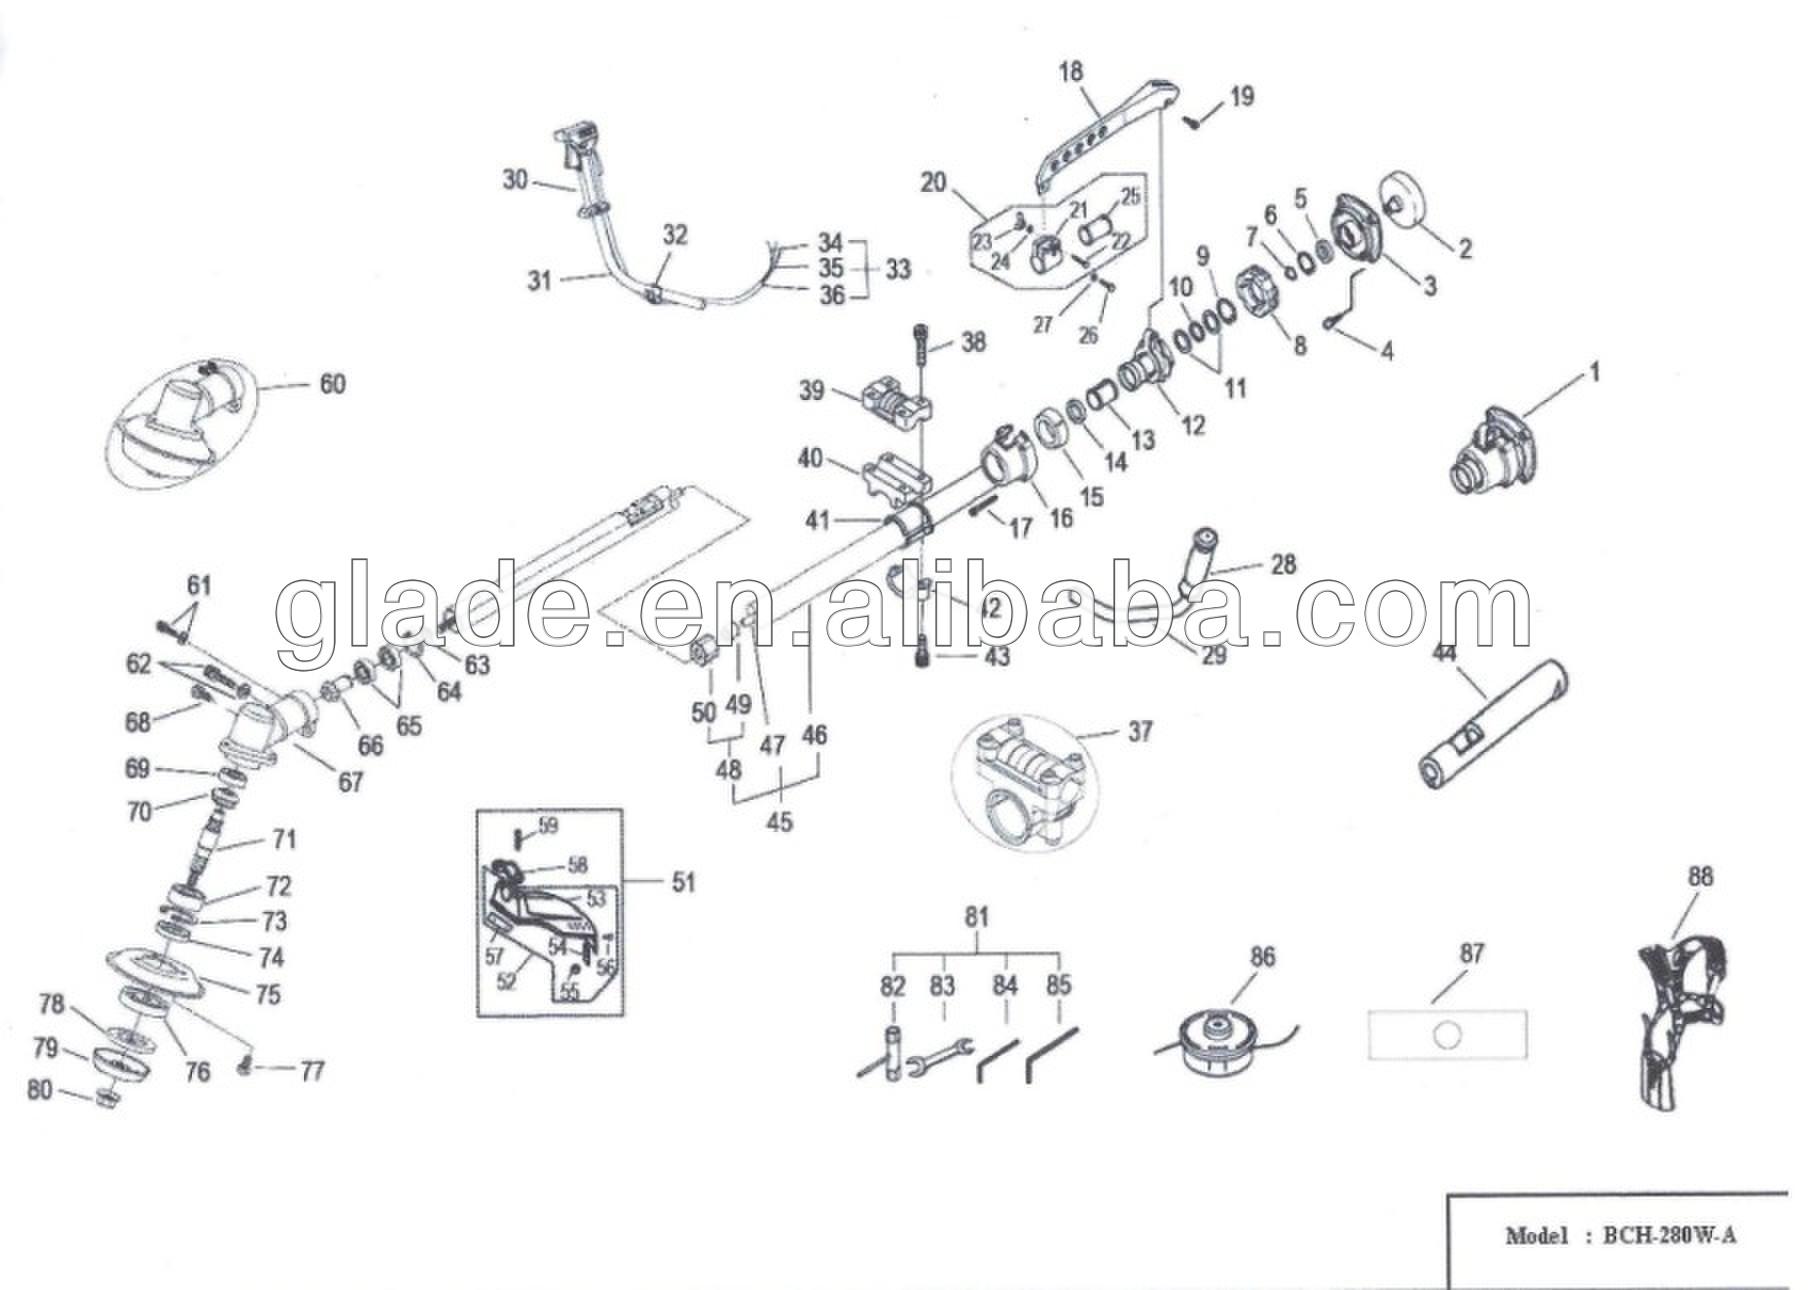 honda gx35 service manual daily instruction manual guides u2022 rh testingwordpress co honda gx35 service manual honda gx35 repair manual pdf